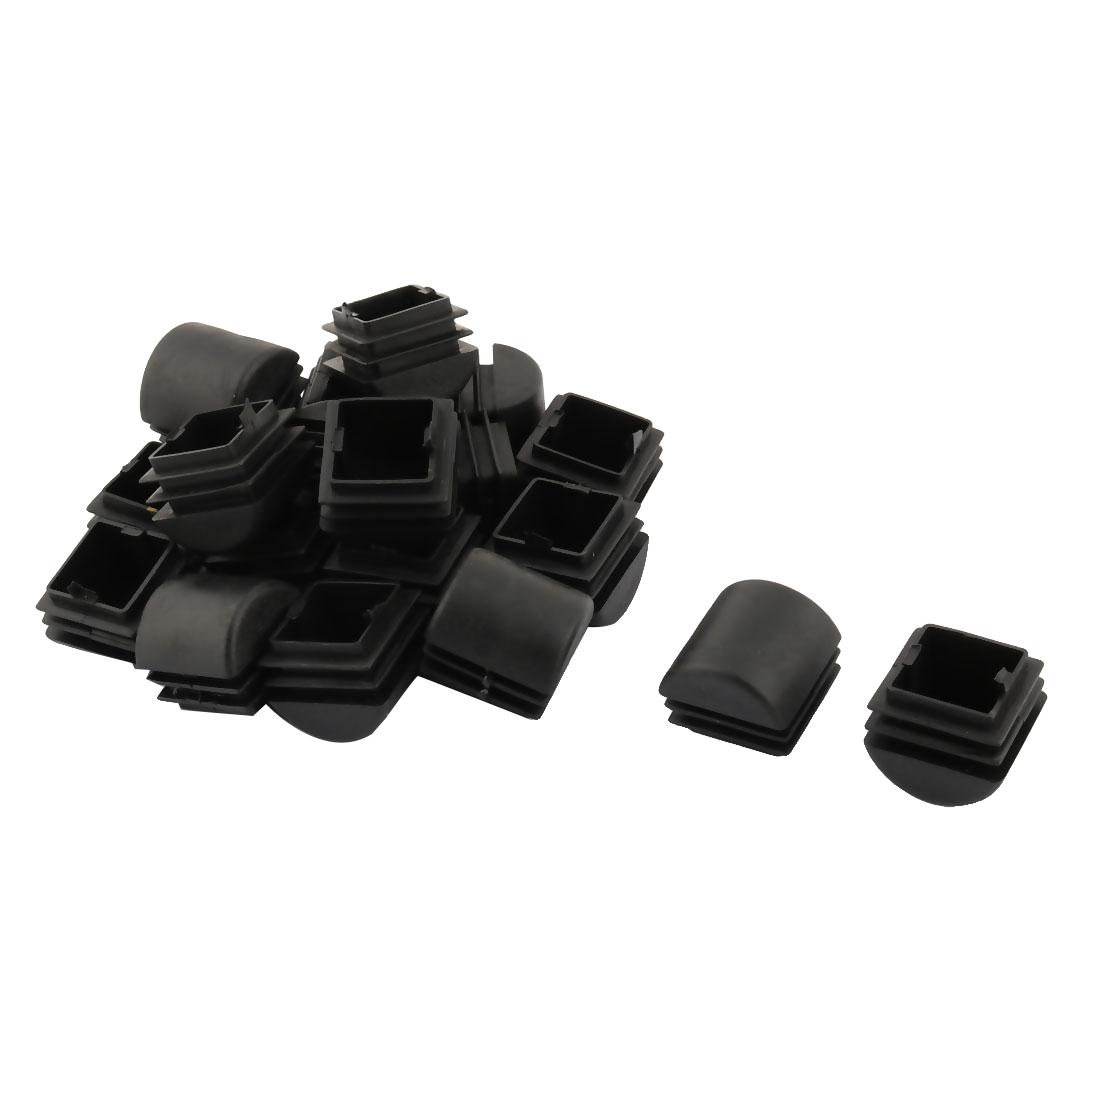 Plastic Square Design Tube Insert End Blanking Cover Cap Black 25 x 25mm 20pcs